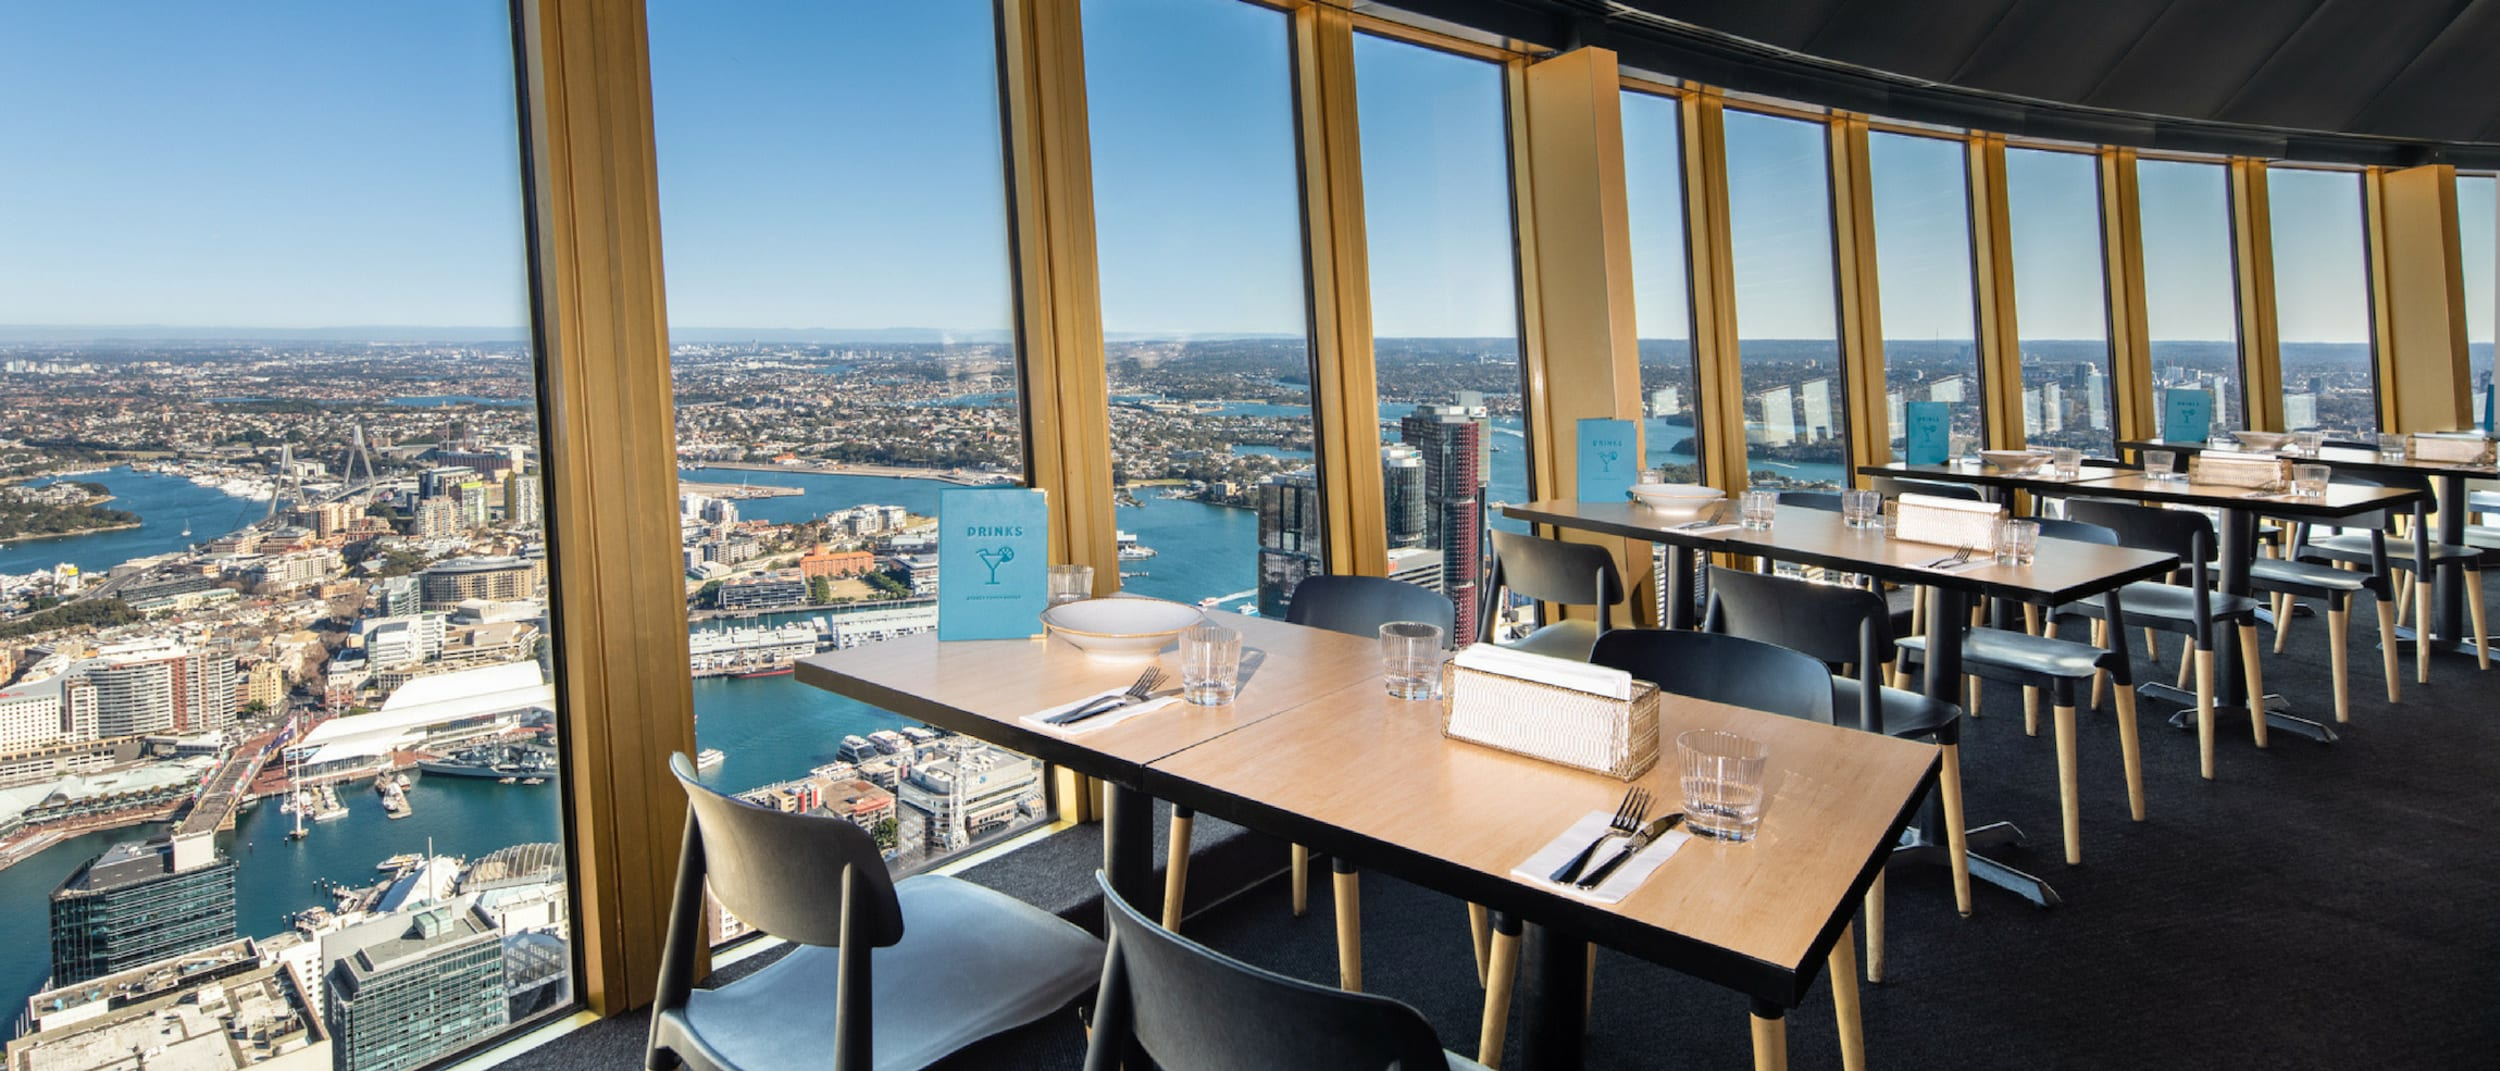 Sydney Tower Buffet: Lunar New Year offer